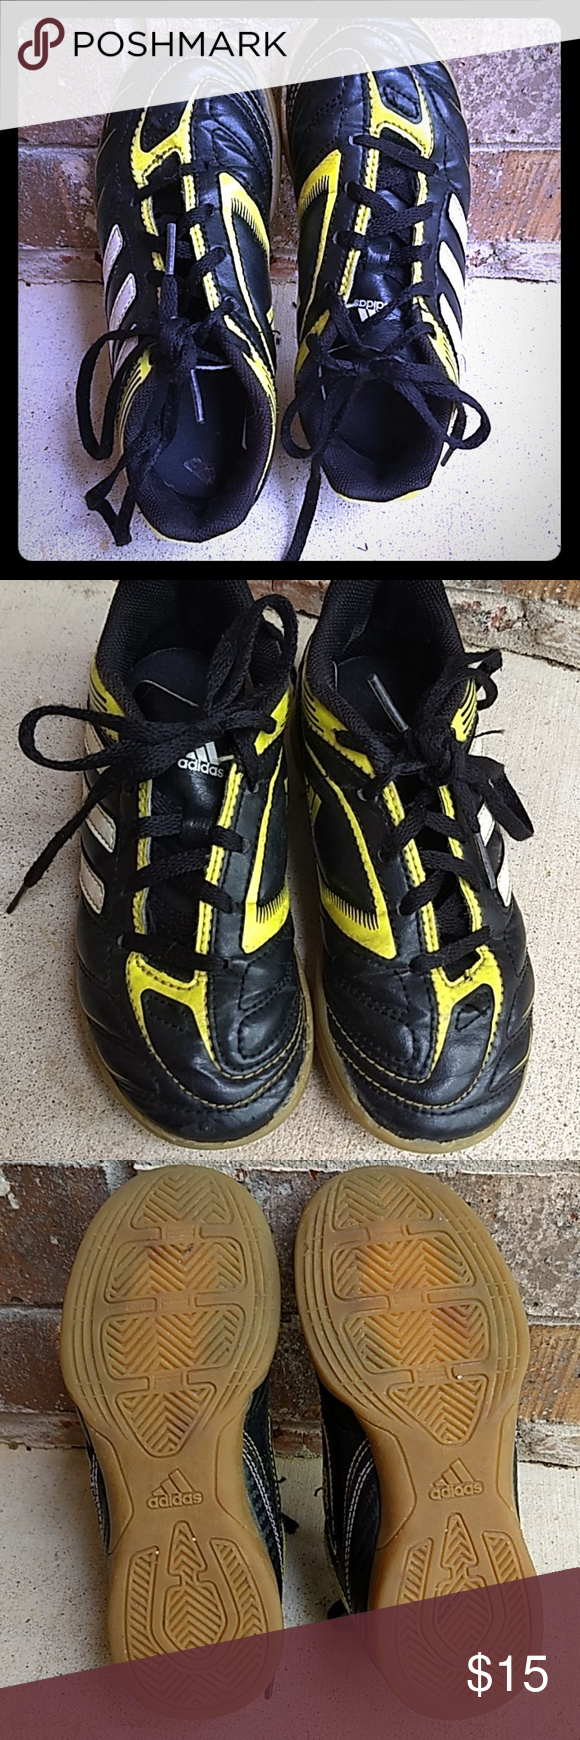 Adidas Boy Shoes size 13   Boy shoes, Shoes, Adidas